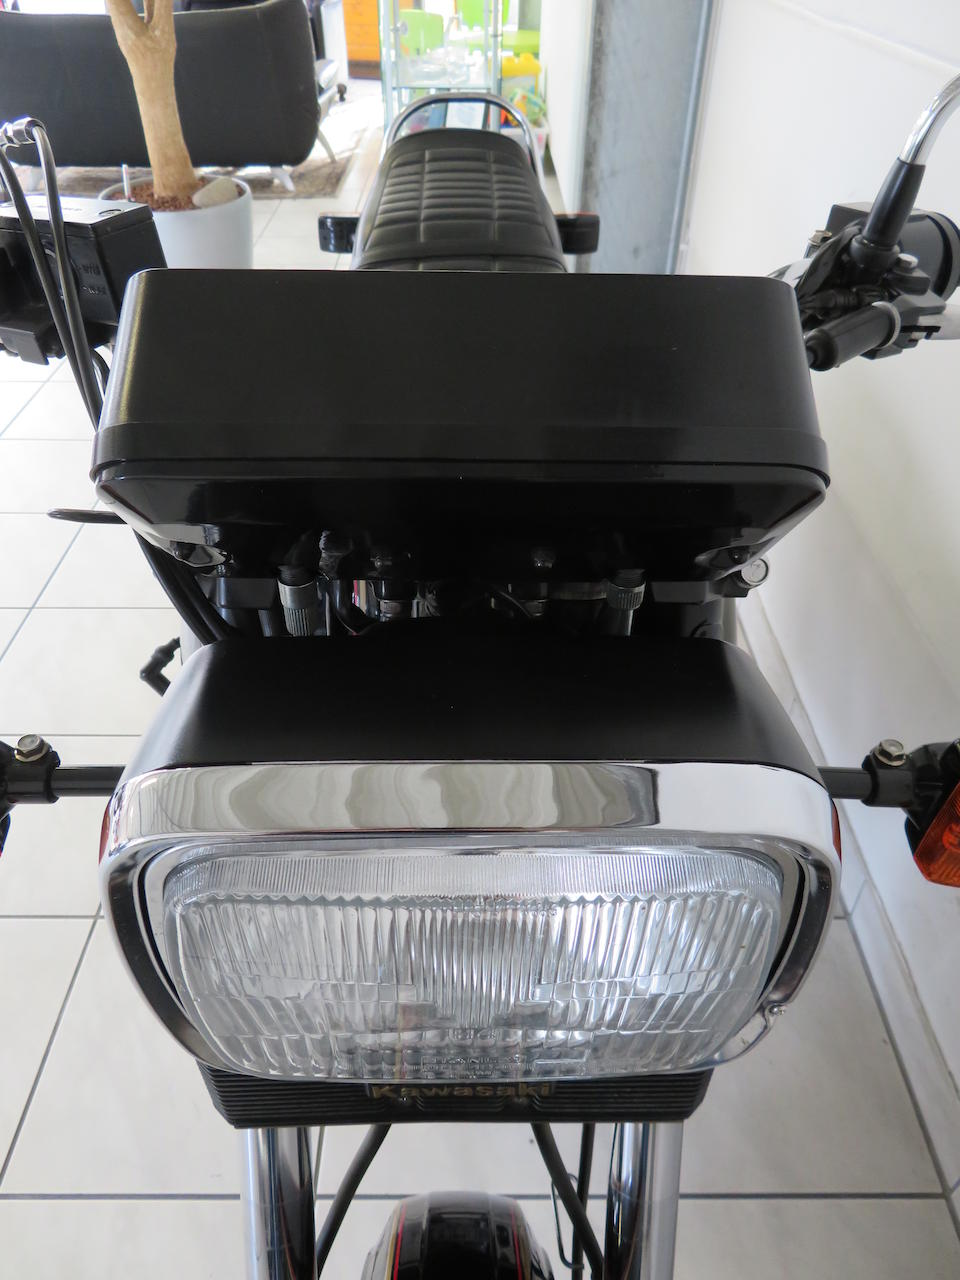 1983 Kawasaki Z1300 Frame no. KZ130A-015933 Engine no. KZT30AE-16442